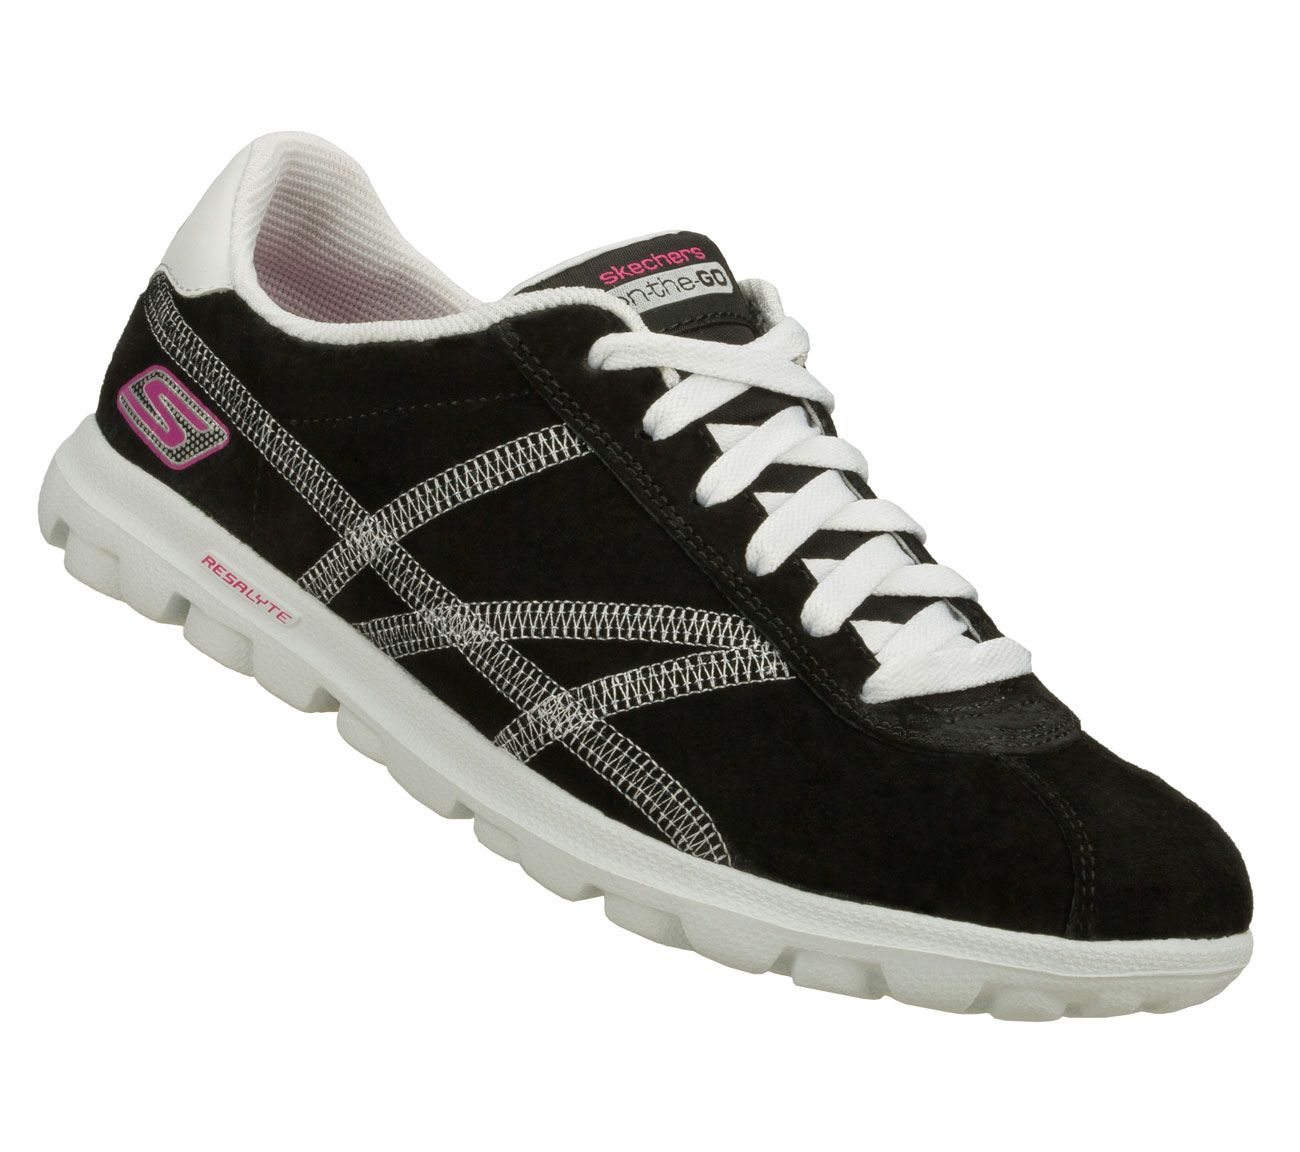 Buy SKECHERS Women's Skechers On the GO - Sutra Comfort Shoes only $60.00